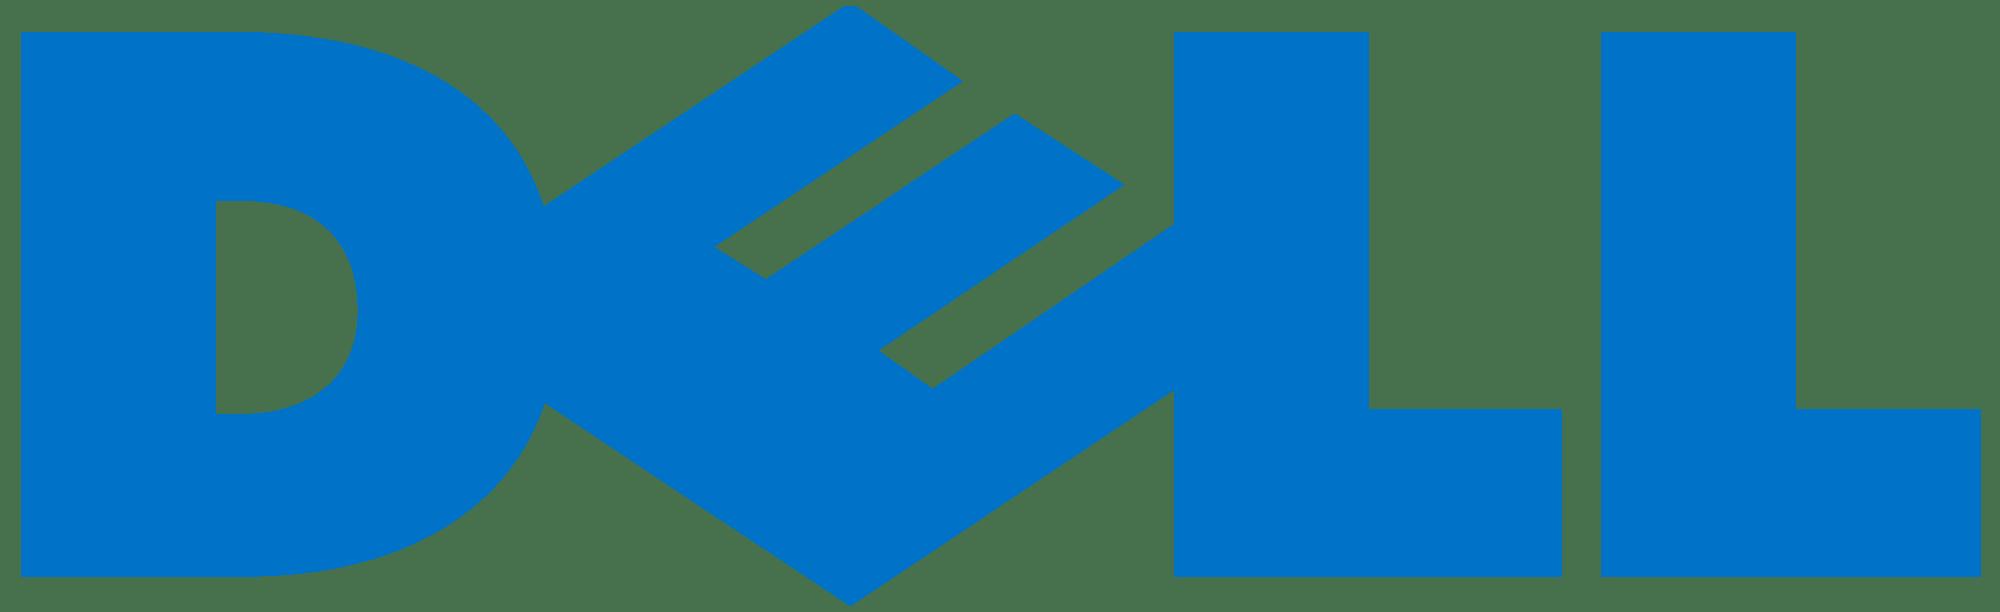 Dell serwis laptopów